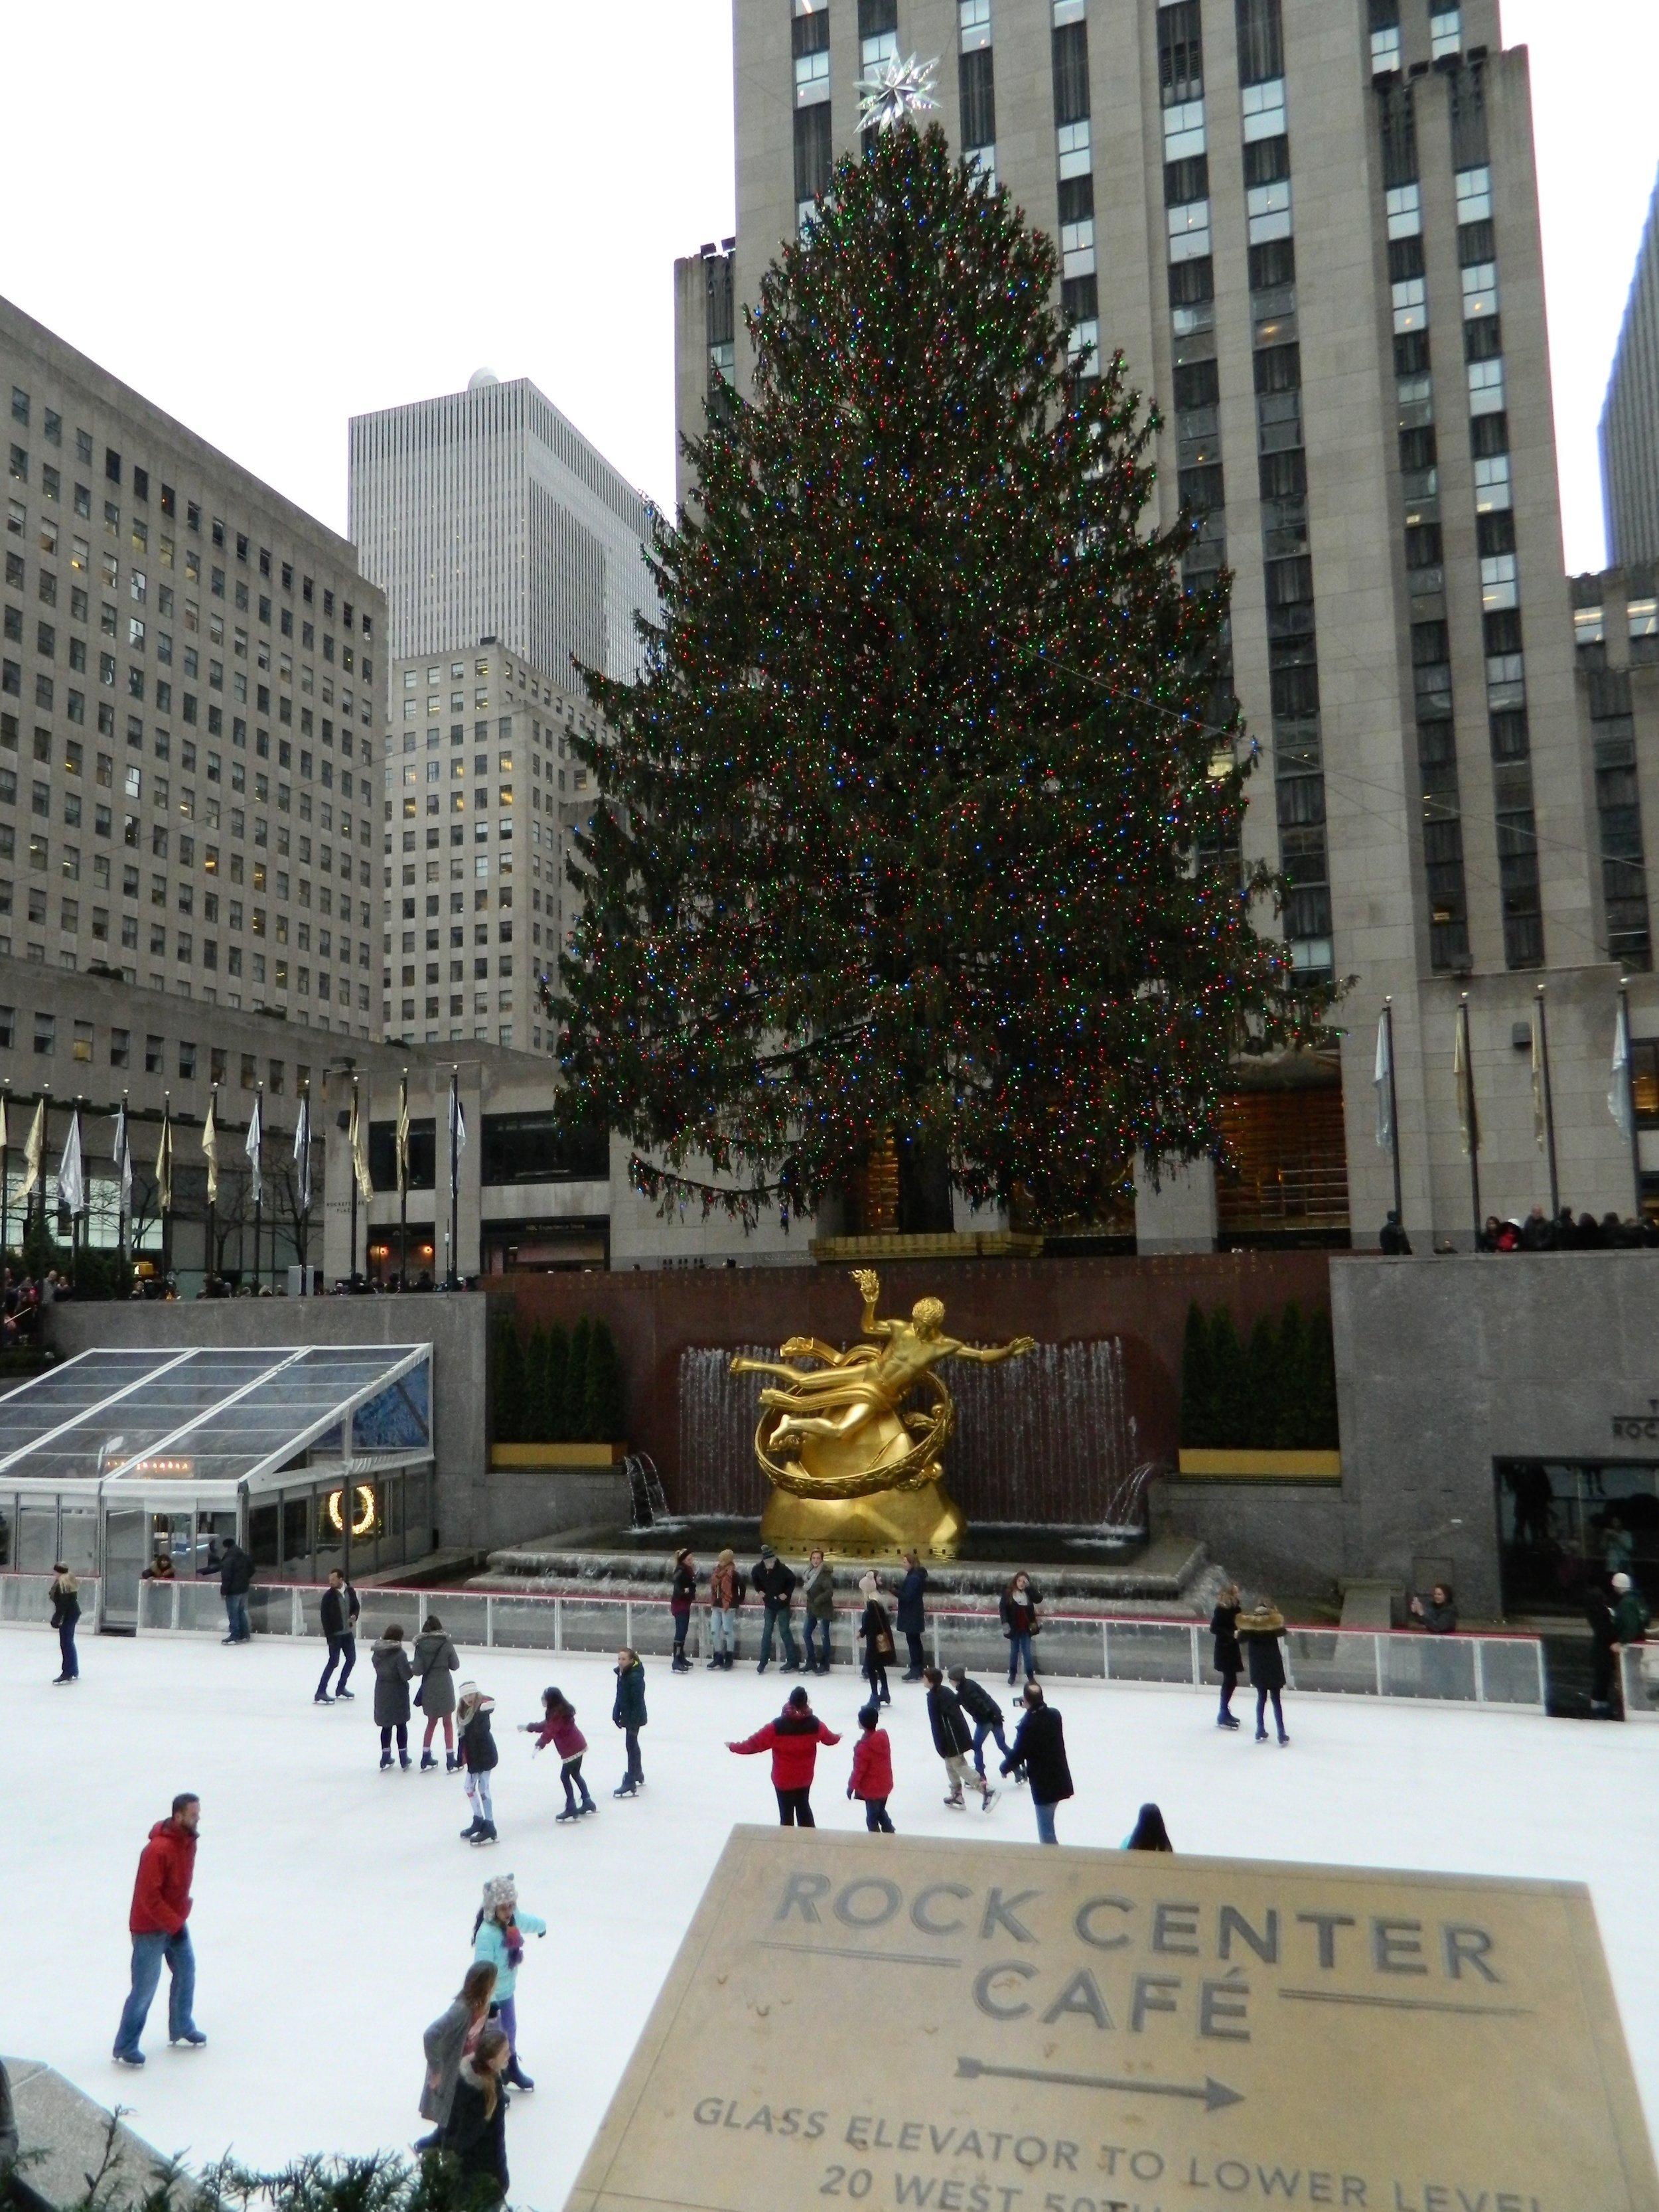 The gorgeous tree in Rockefeller Plaza